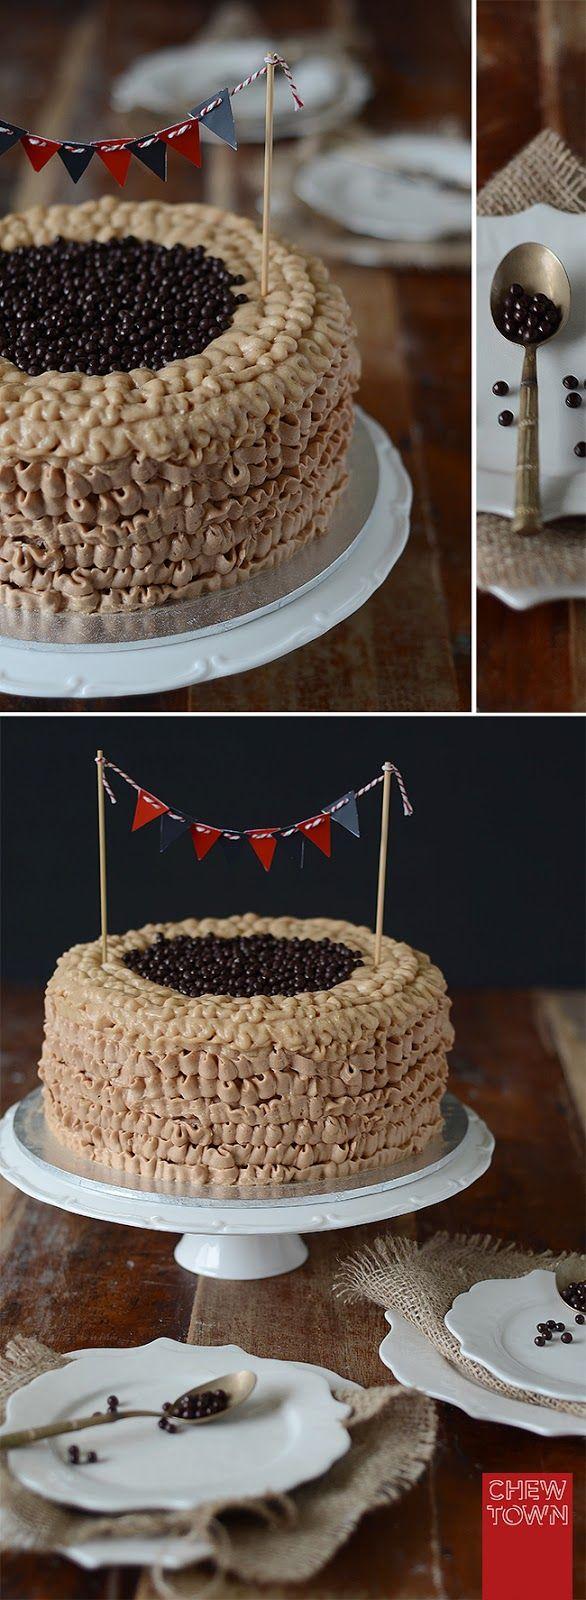 Chew Town: Valrhona Chocolate Cake with dulce de leche